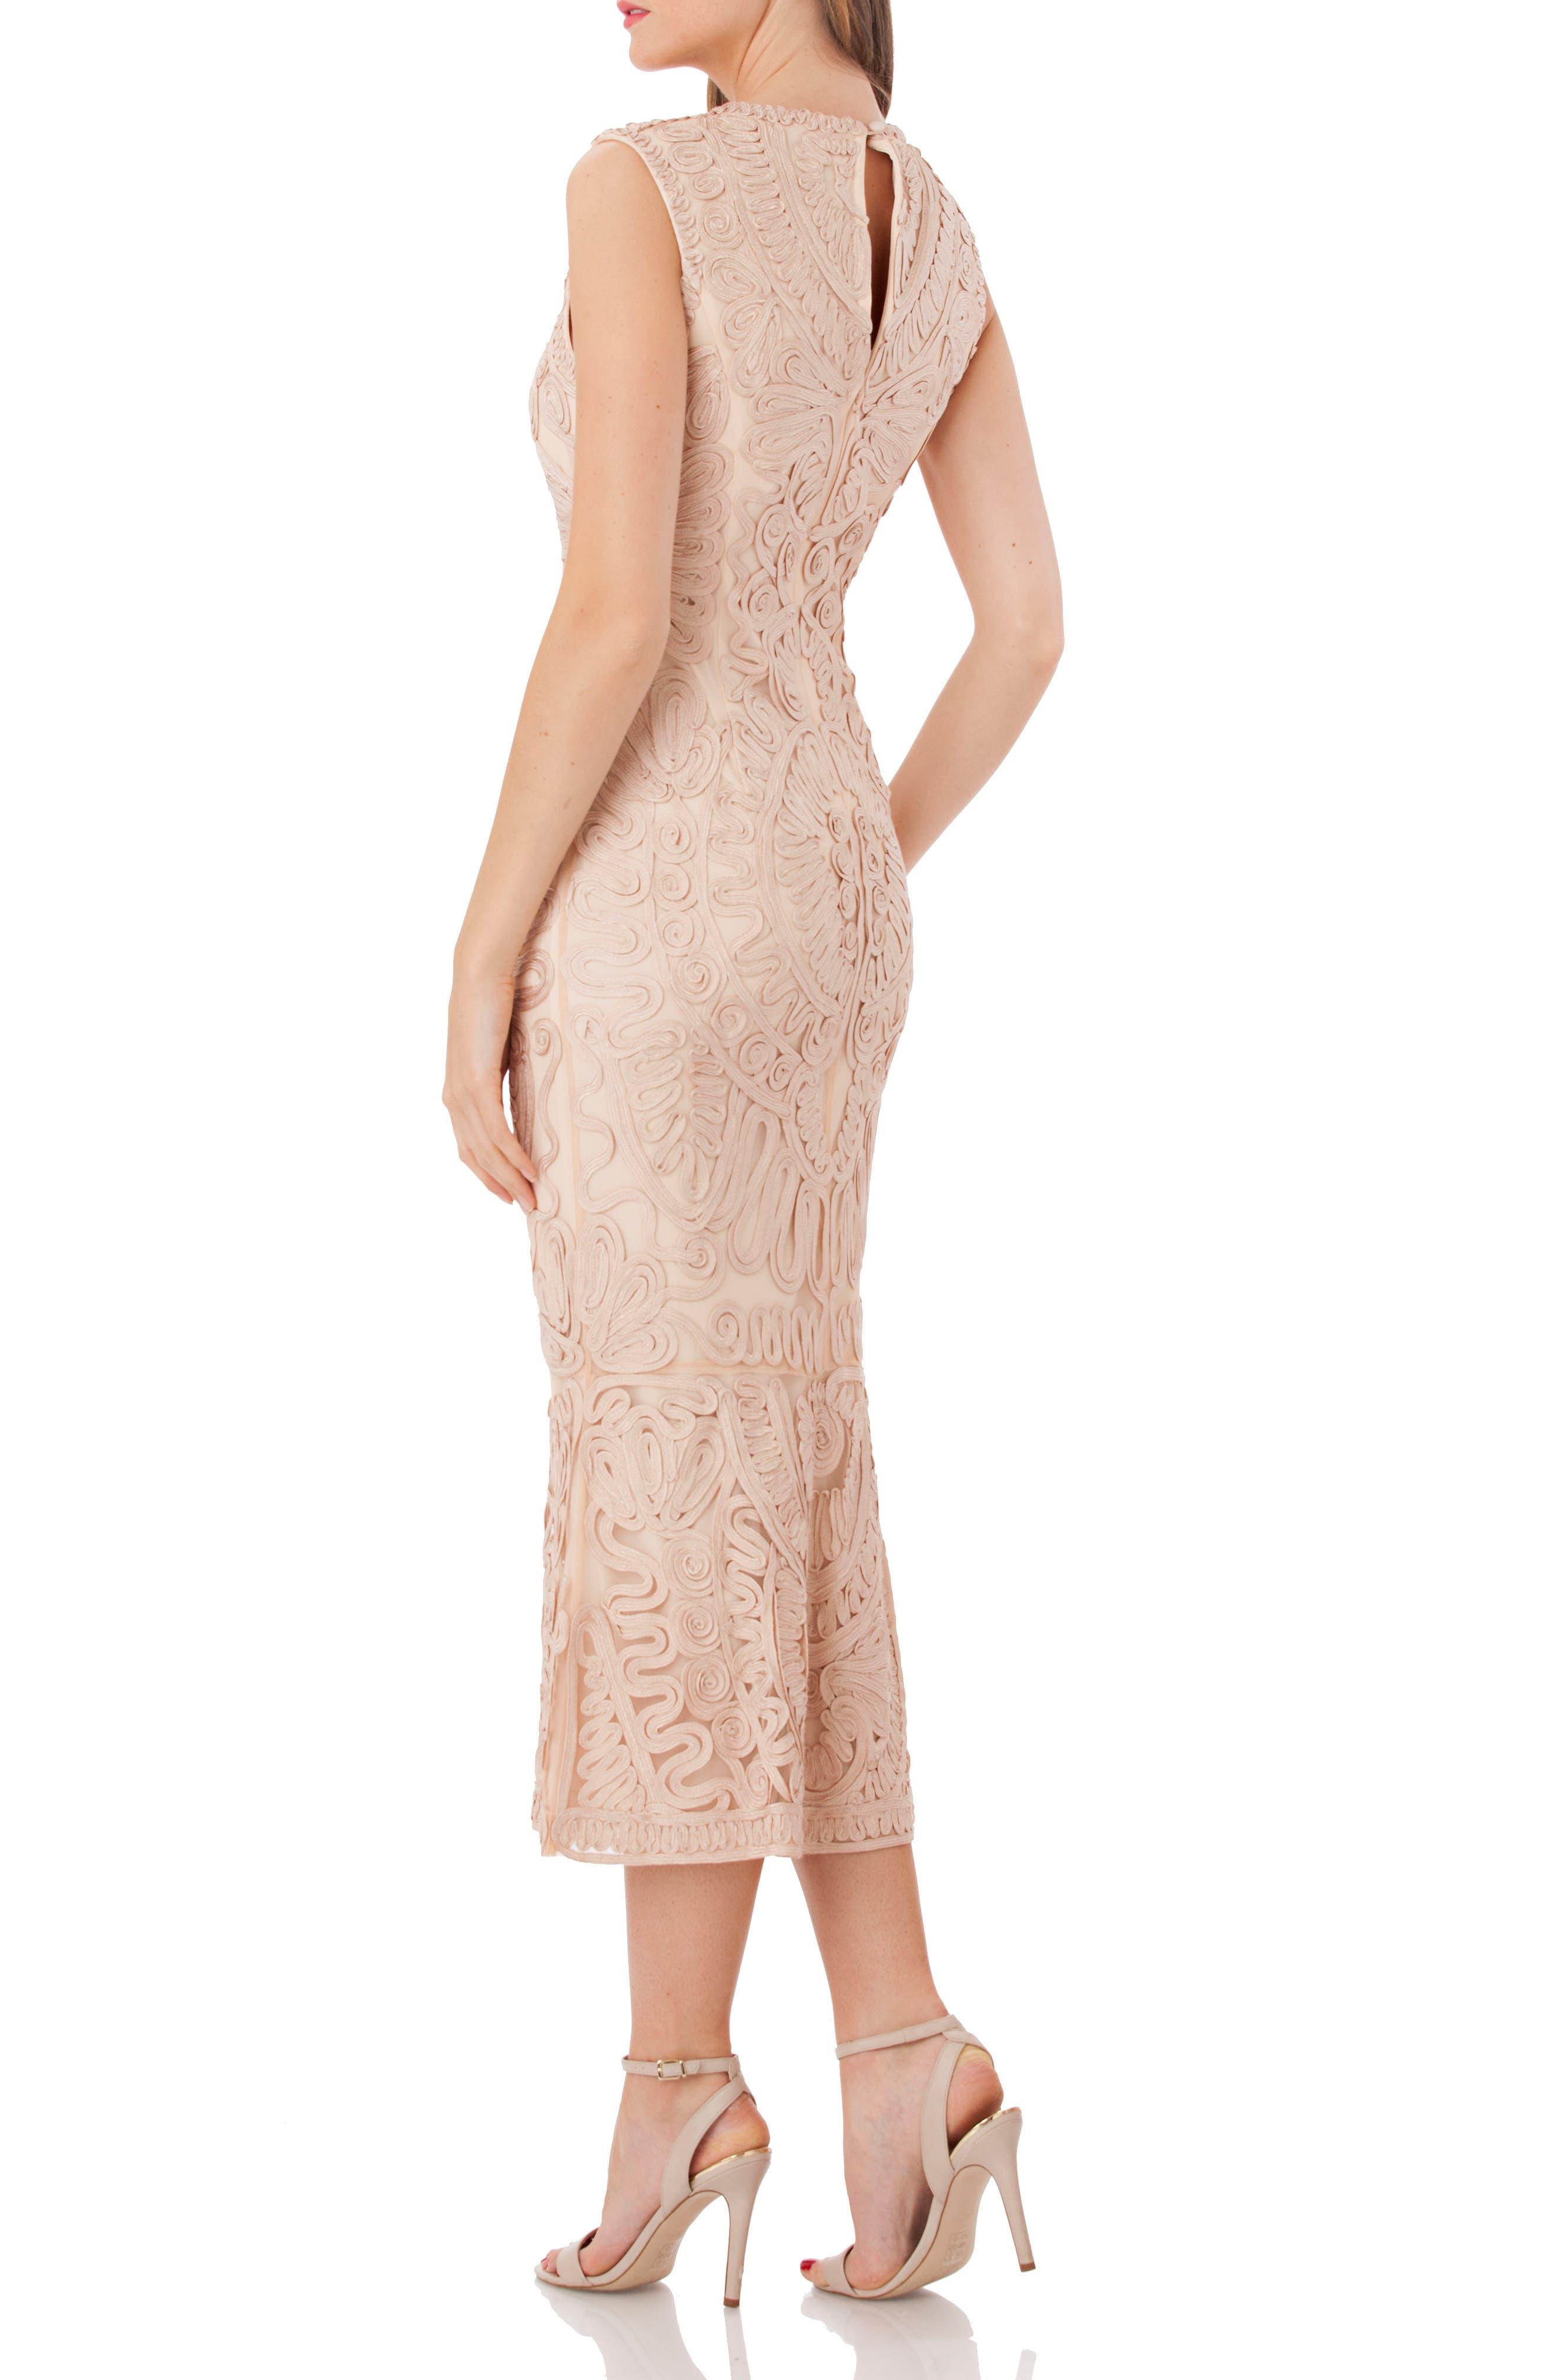 Beige Cocktail & Party Dresses